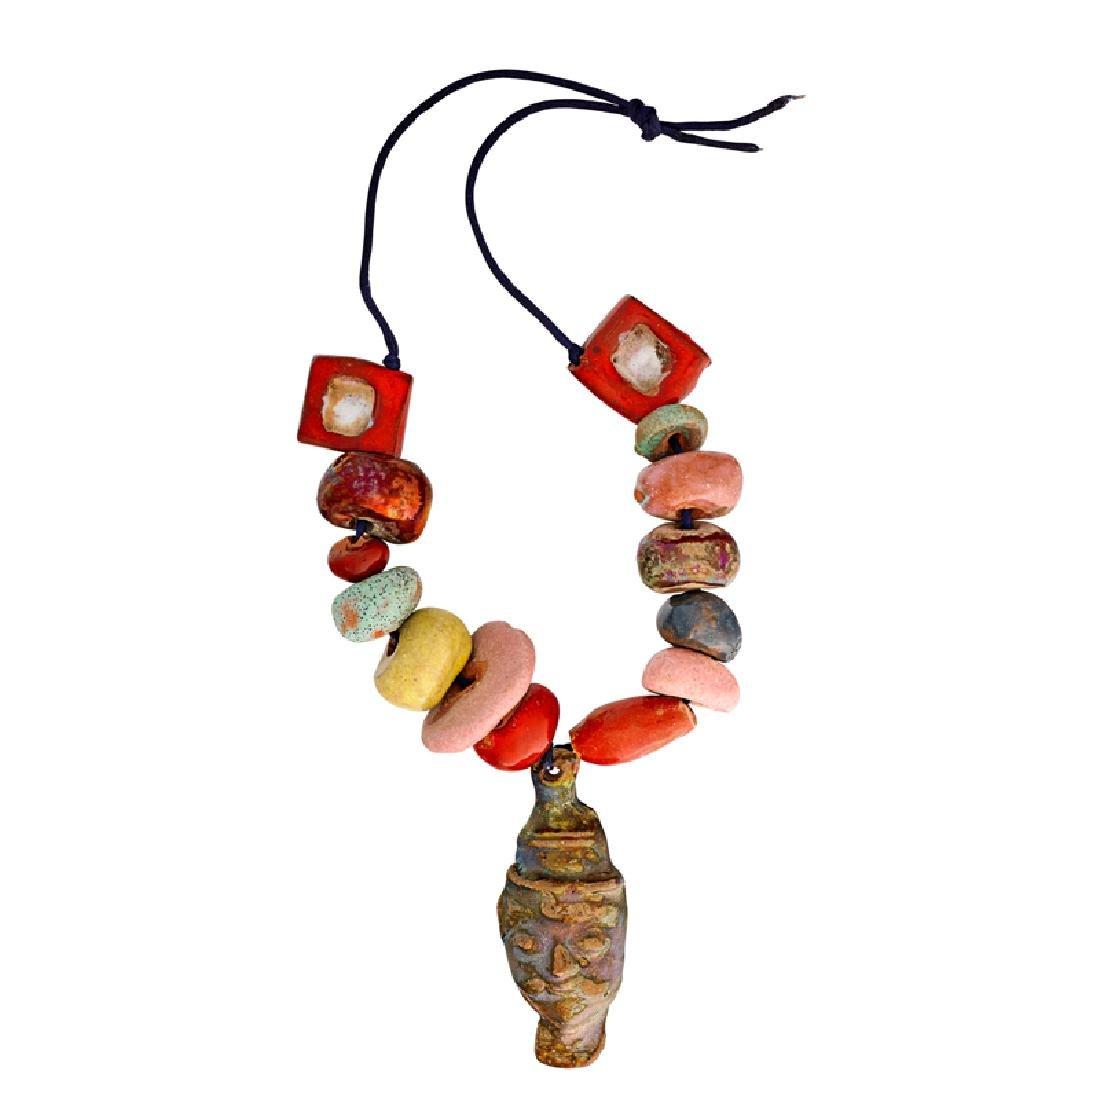 BEATRICE WOOD Rare necklace